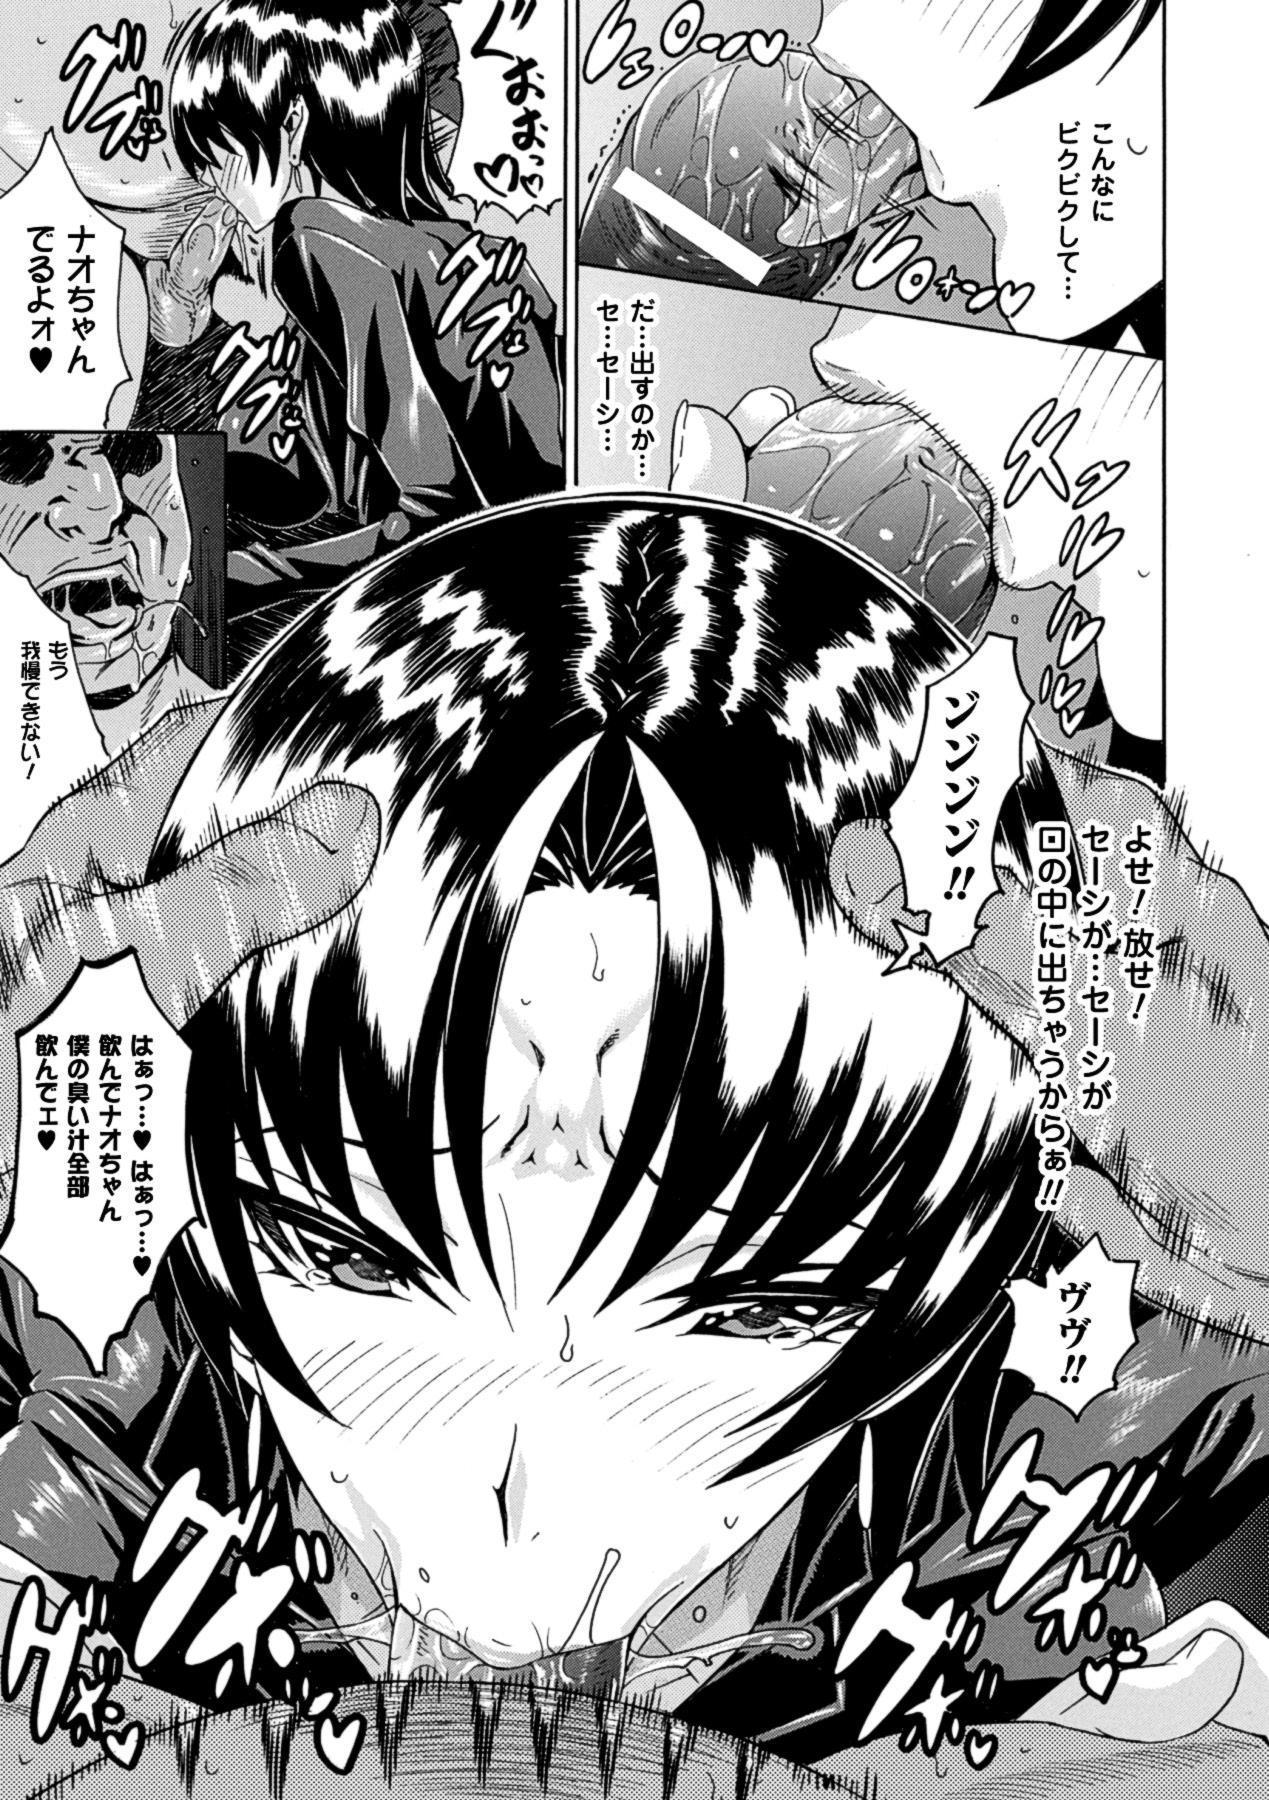 Megami Crisis 10 162